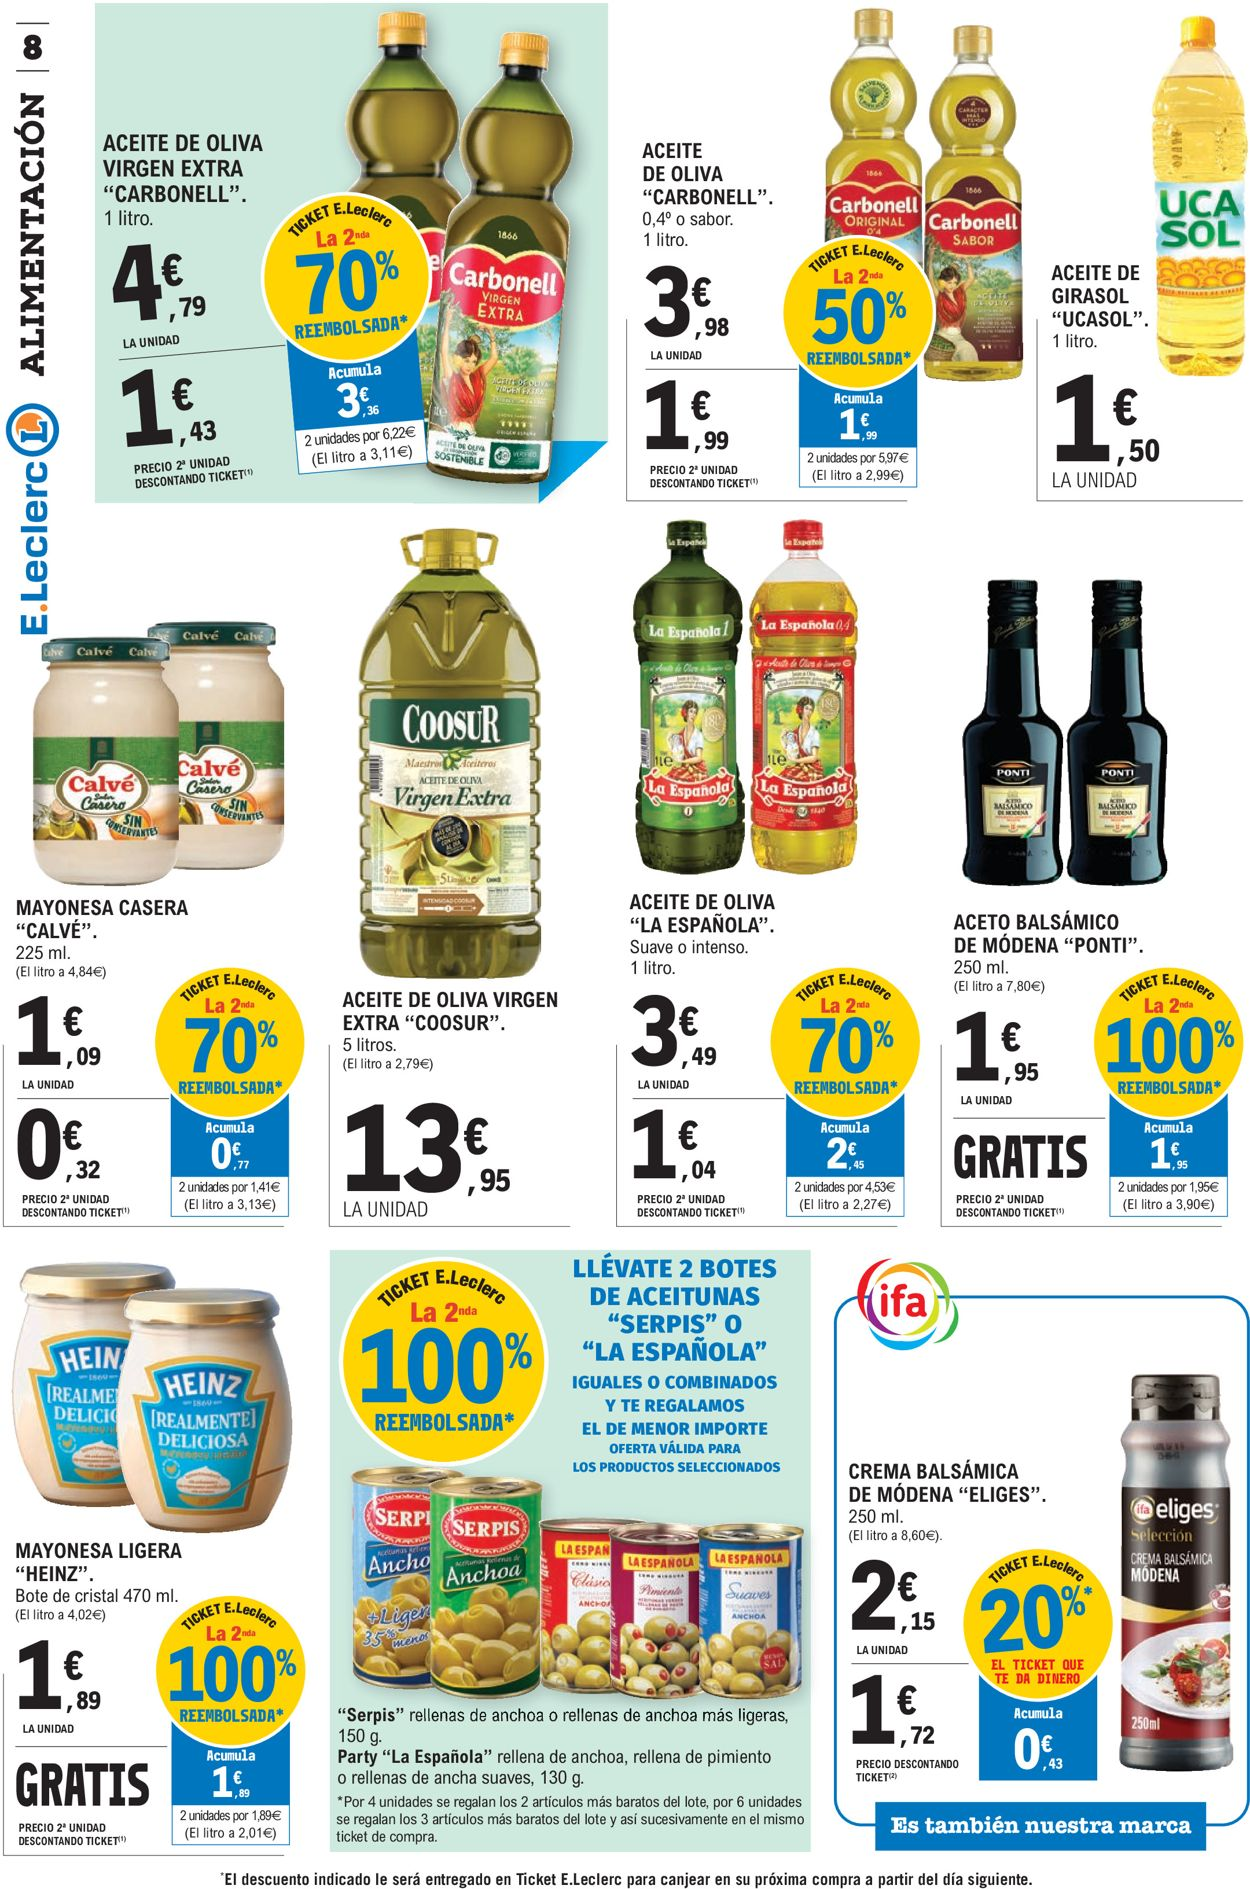 E.leclerc Folleto - 20.01-31.01.2021 (Página 8)